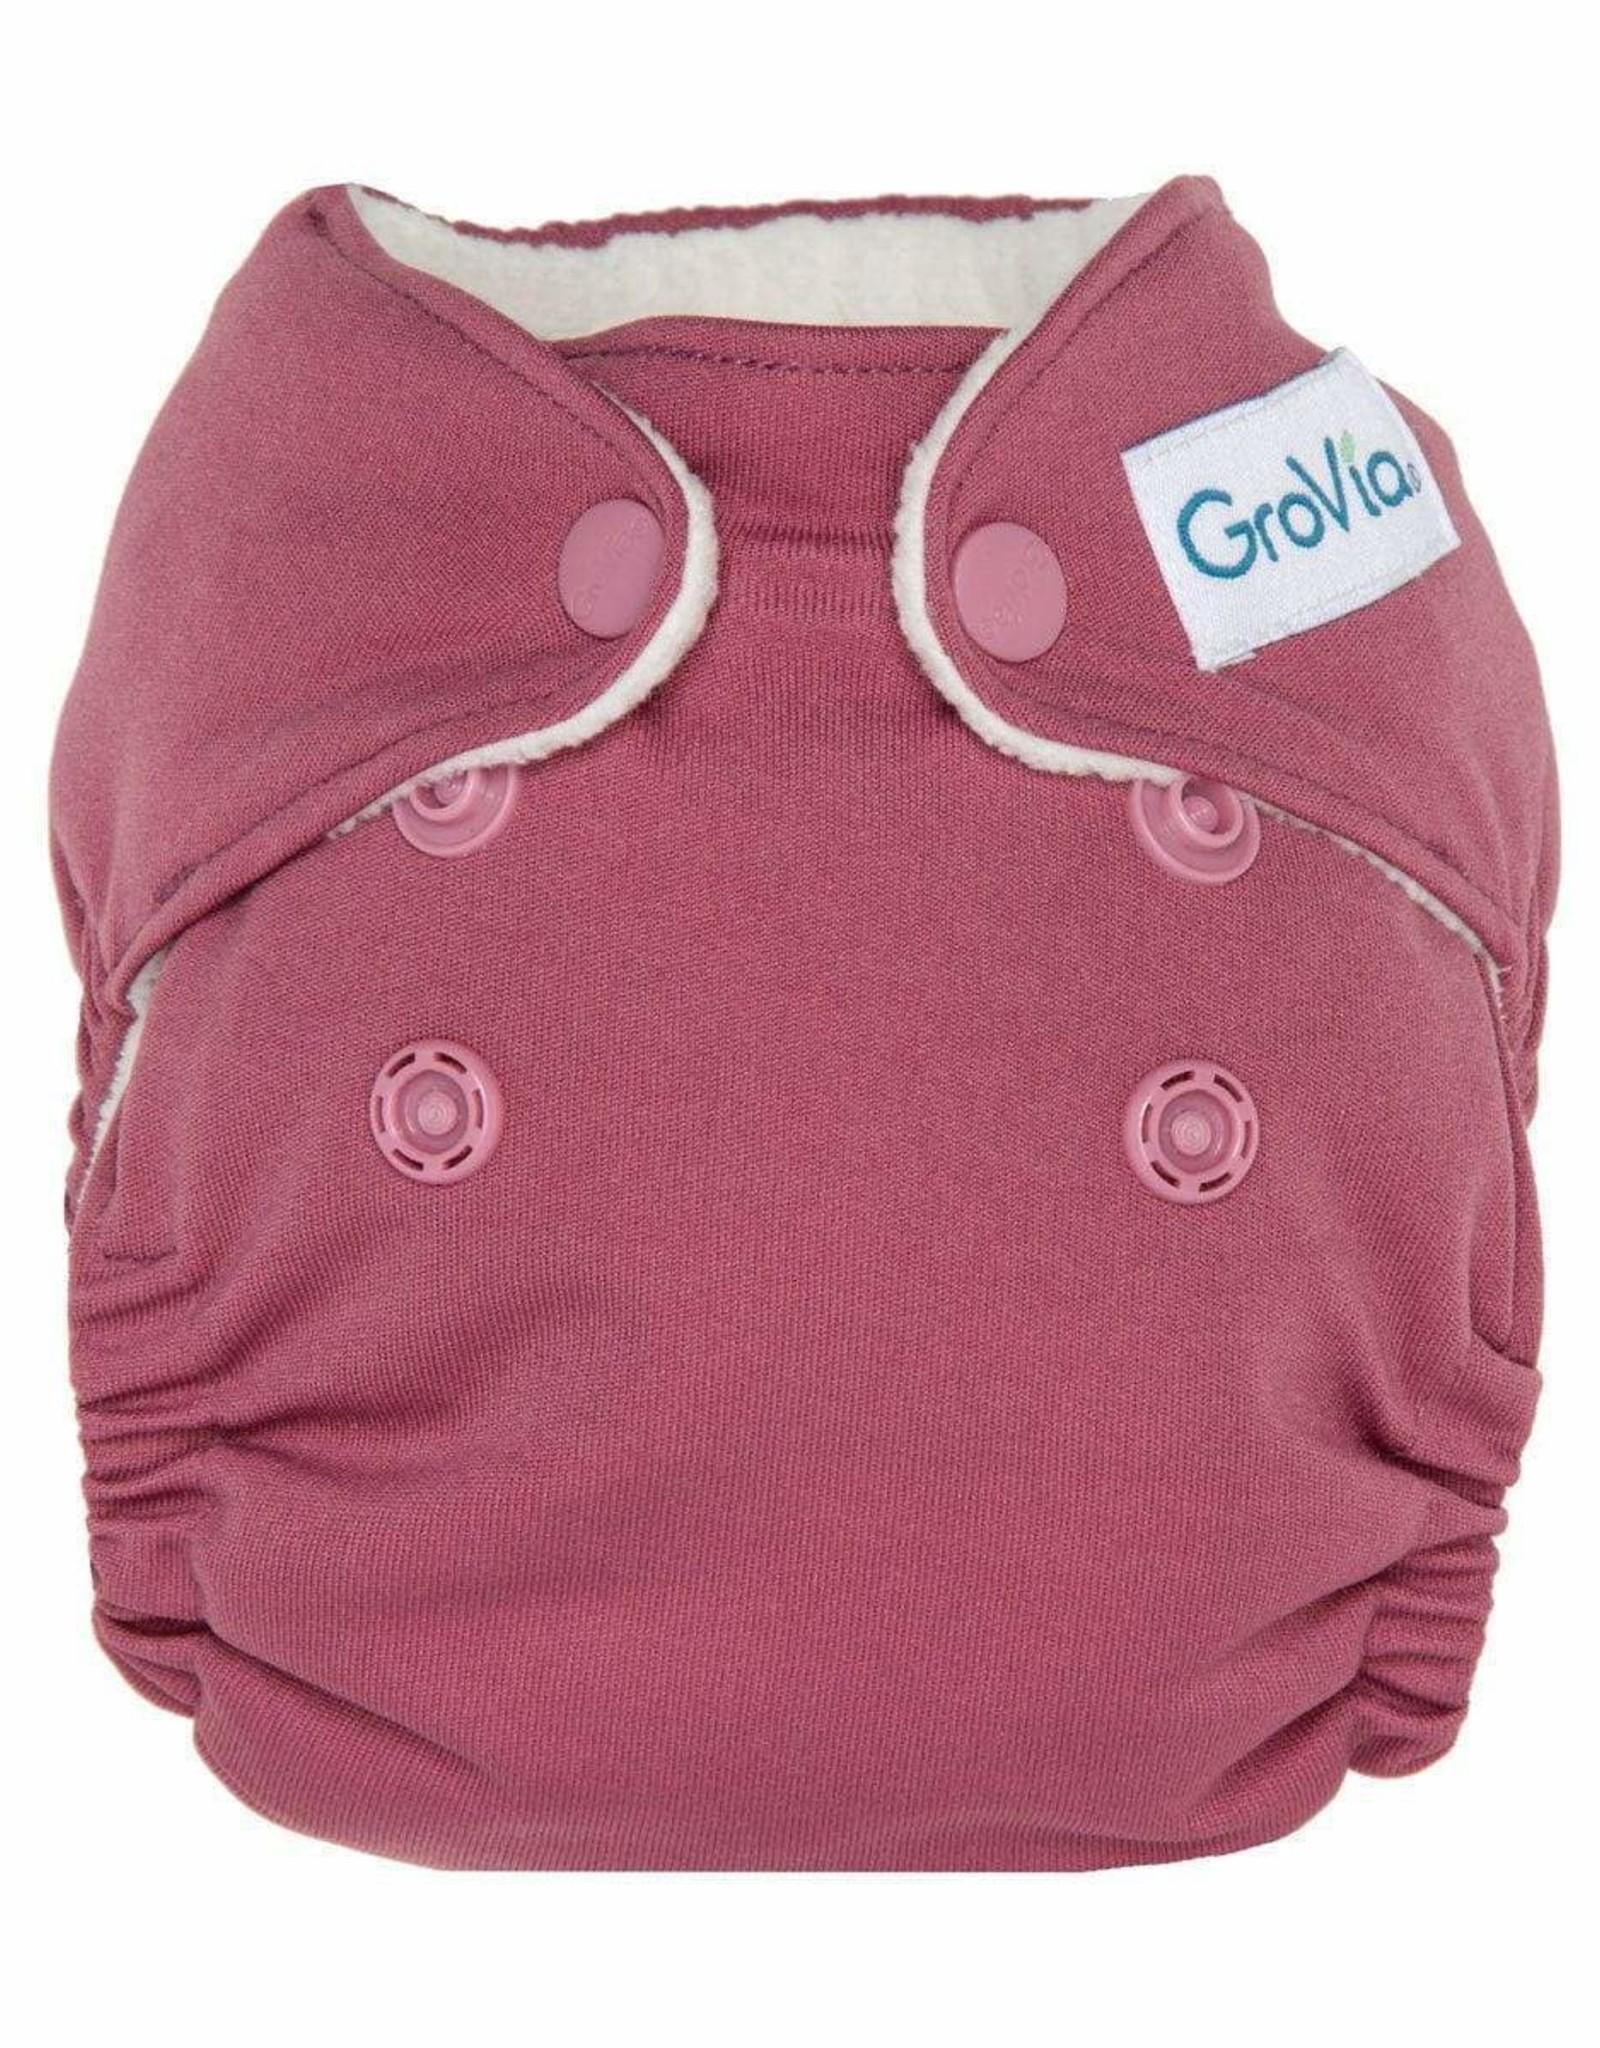 Newborn All in One Cloth Diapers- Petal